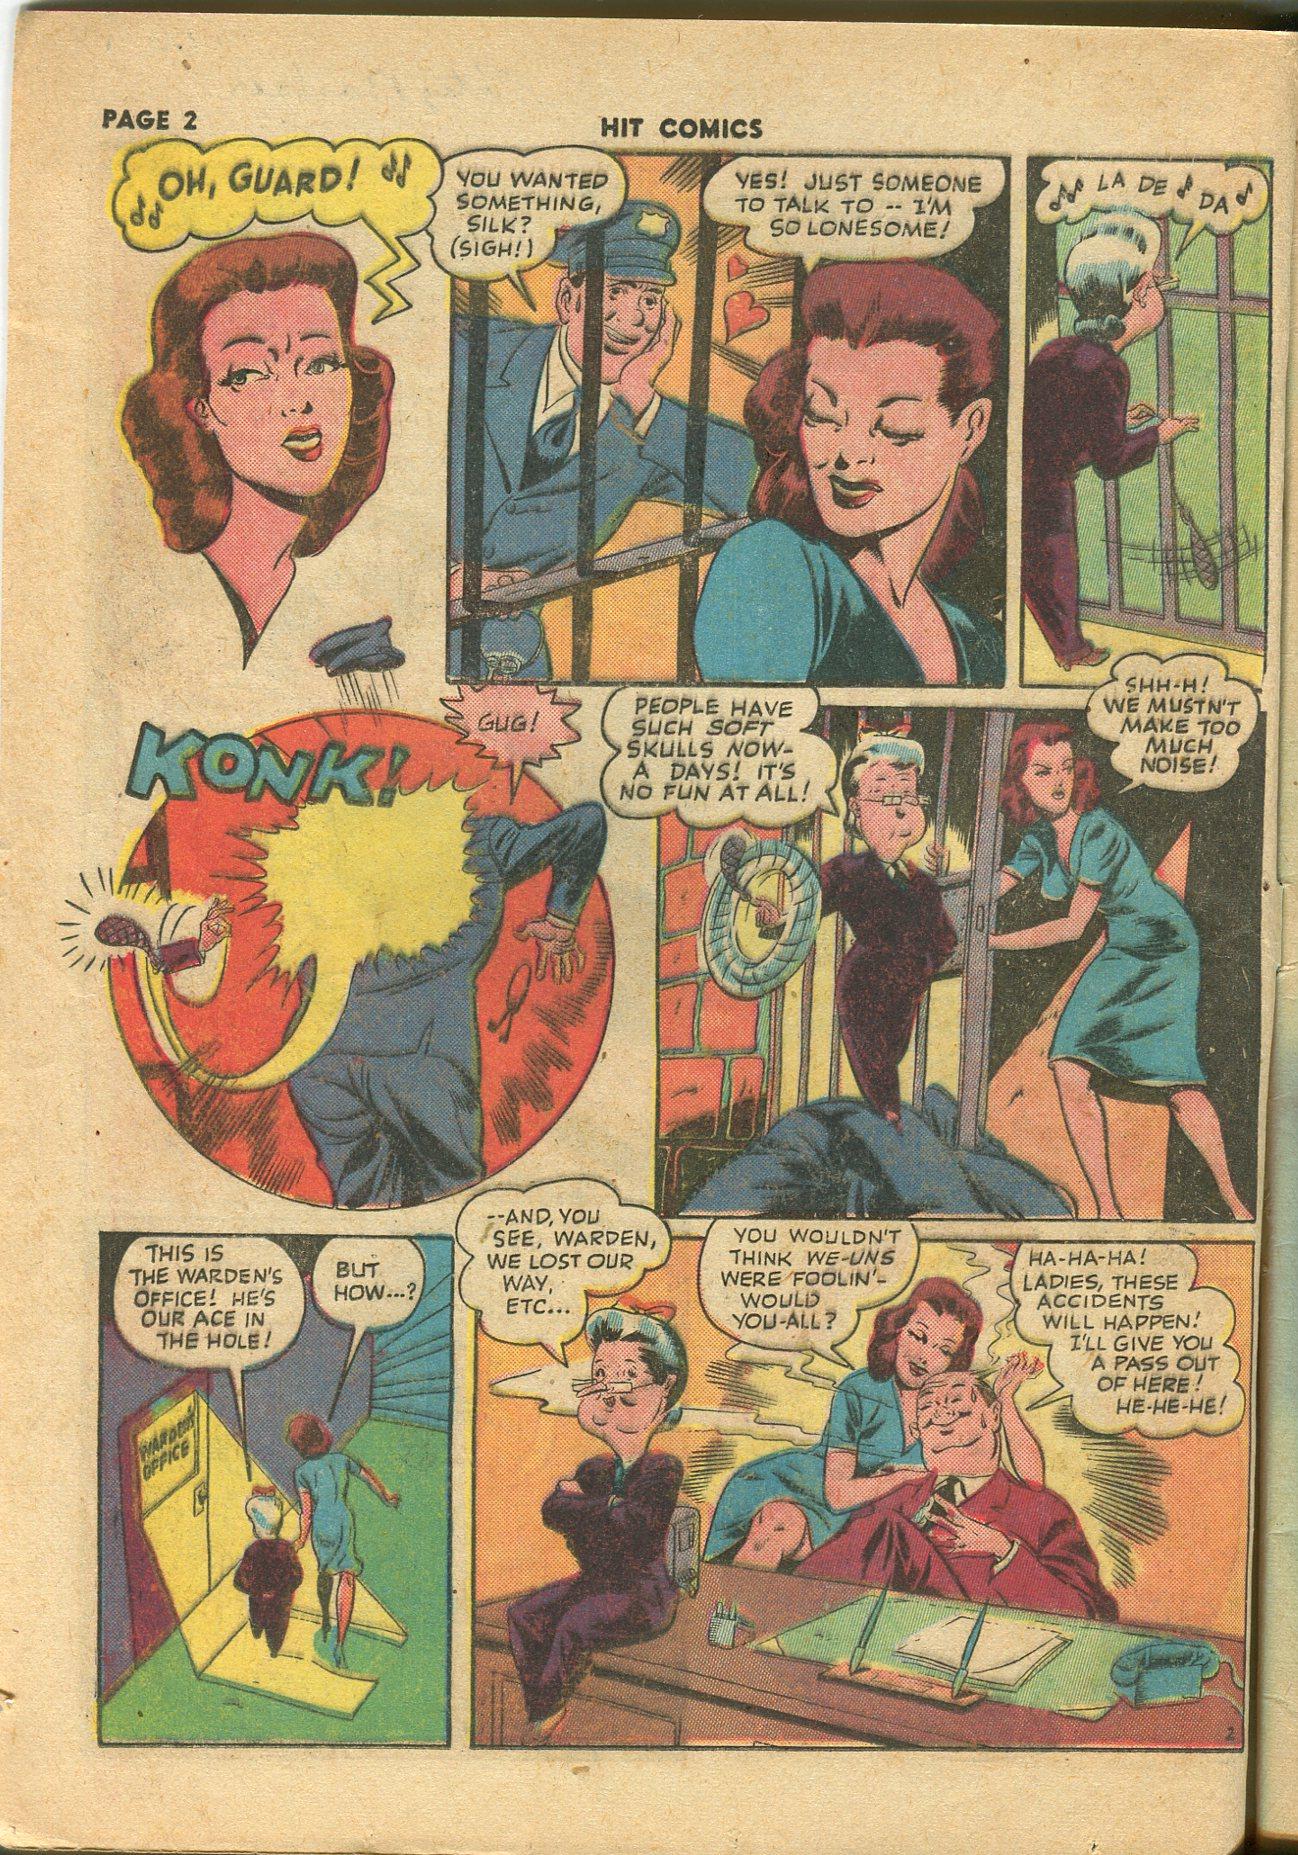 Read online Hit Comics comic -  Issue #28 - 5